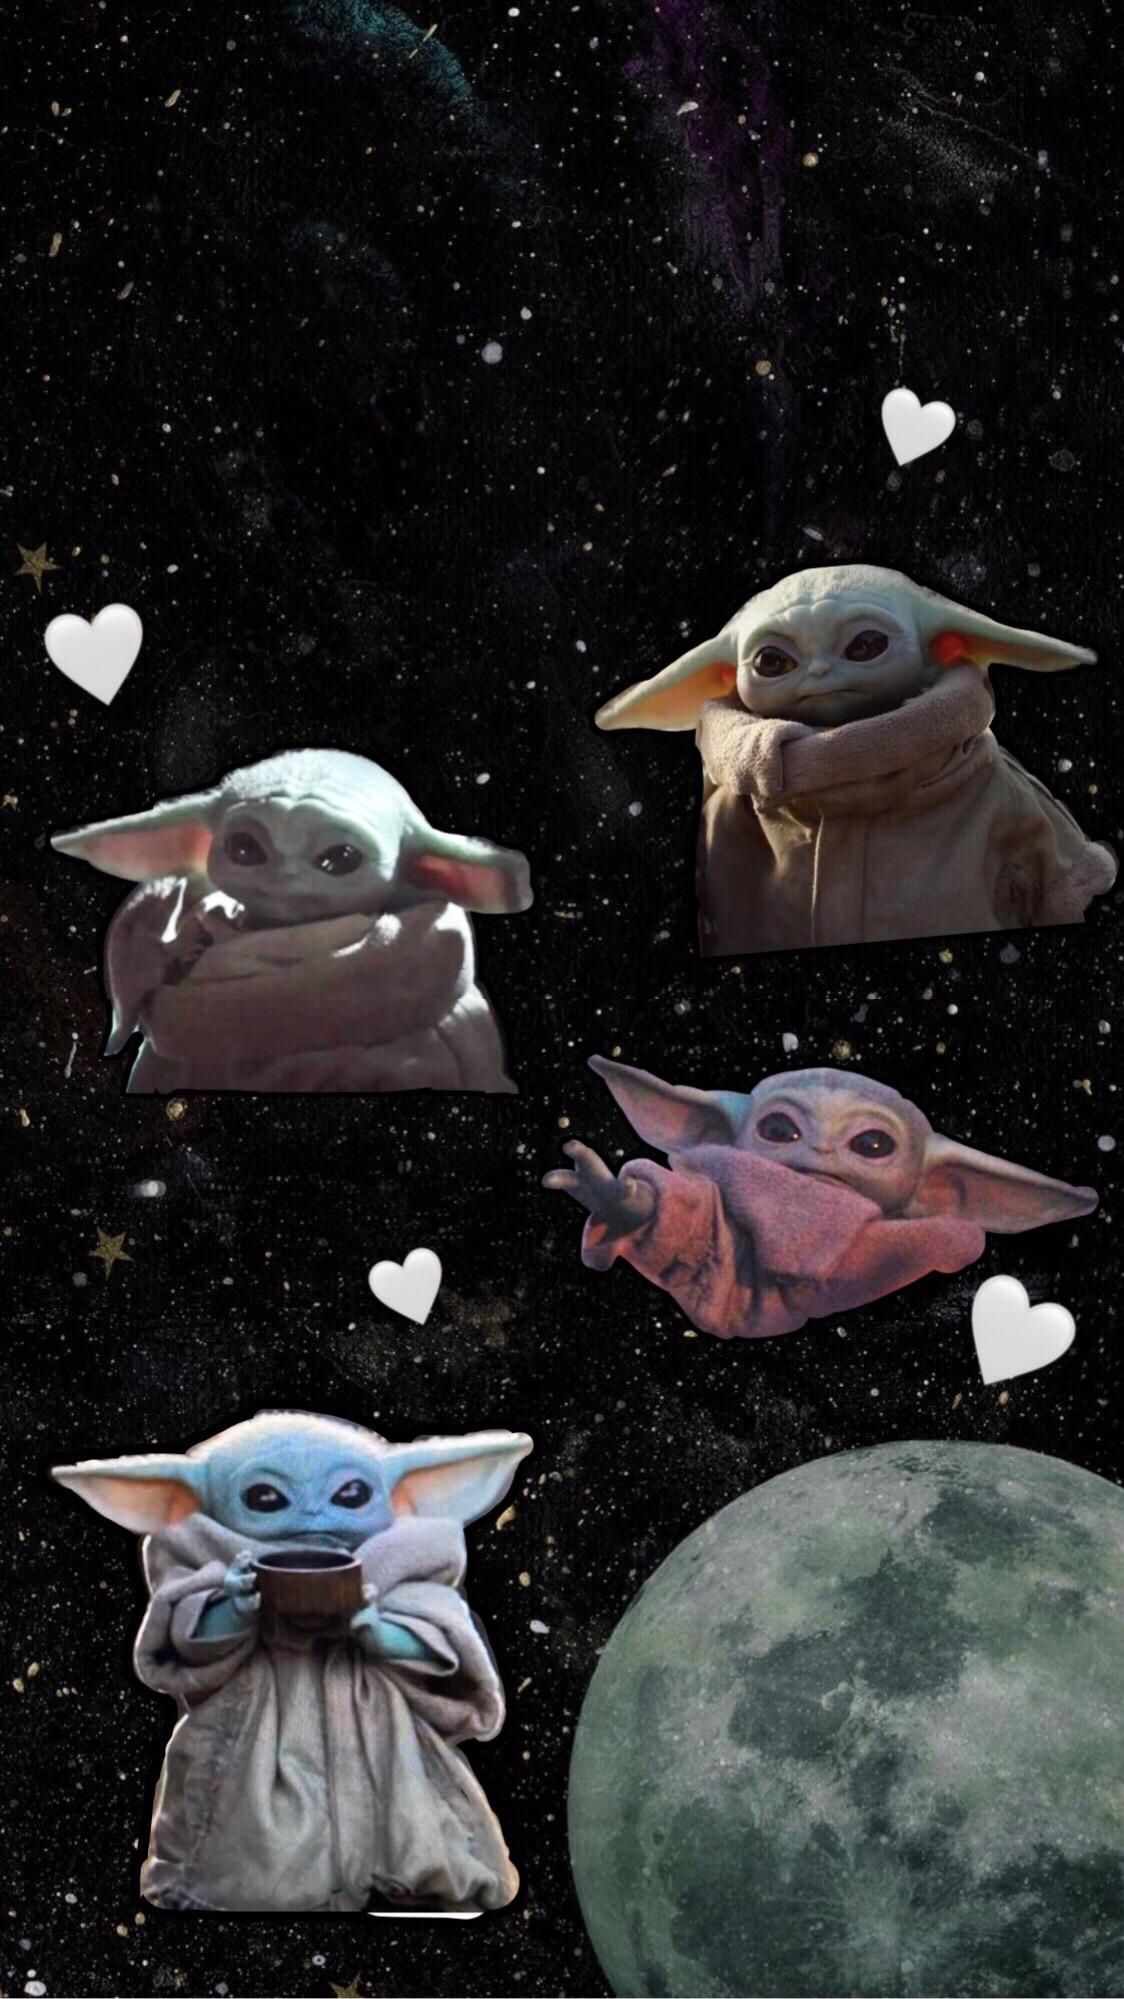 Made A Baby Yoda Lockscreen Wallpaper R Babyyoda Baby Yoda Yoda Wallpaper Star Wars Wallpaper Yoda Images